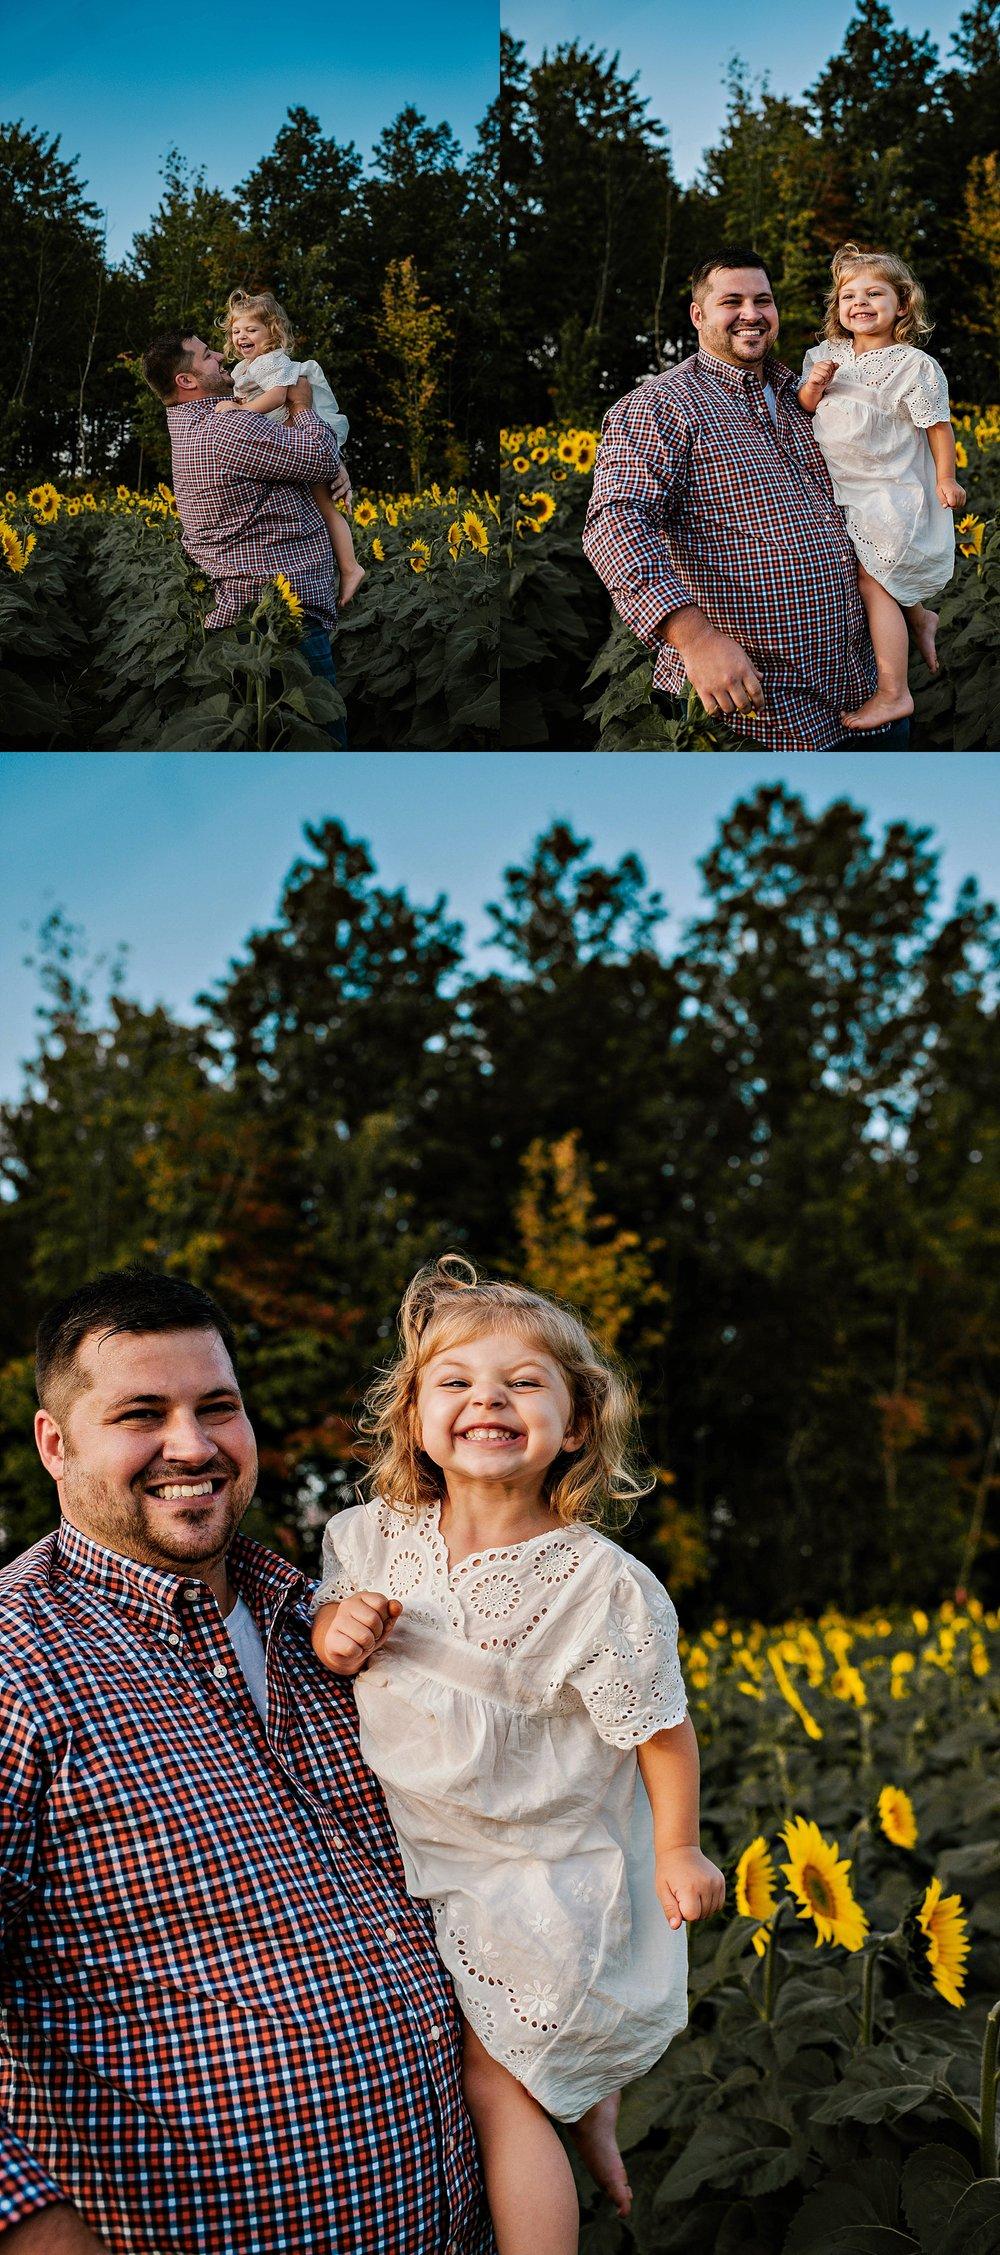 Rutherford-family-cleveland-photographer-lauren-grayson-sunflower-field-session_0028.jpg